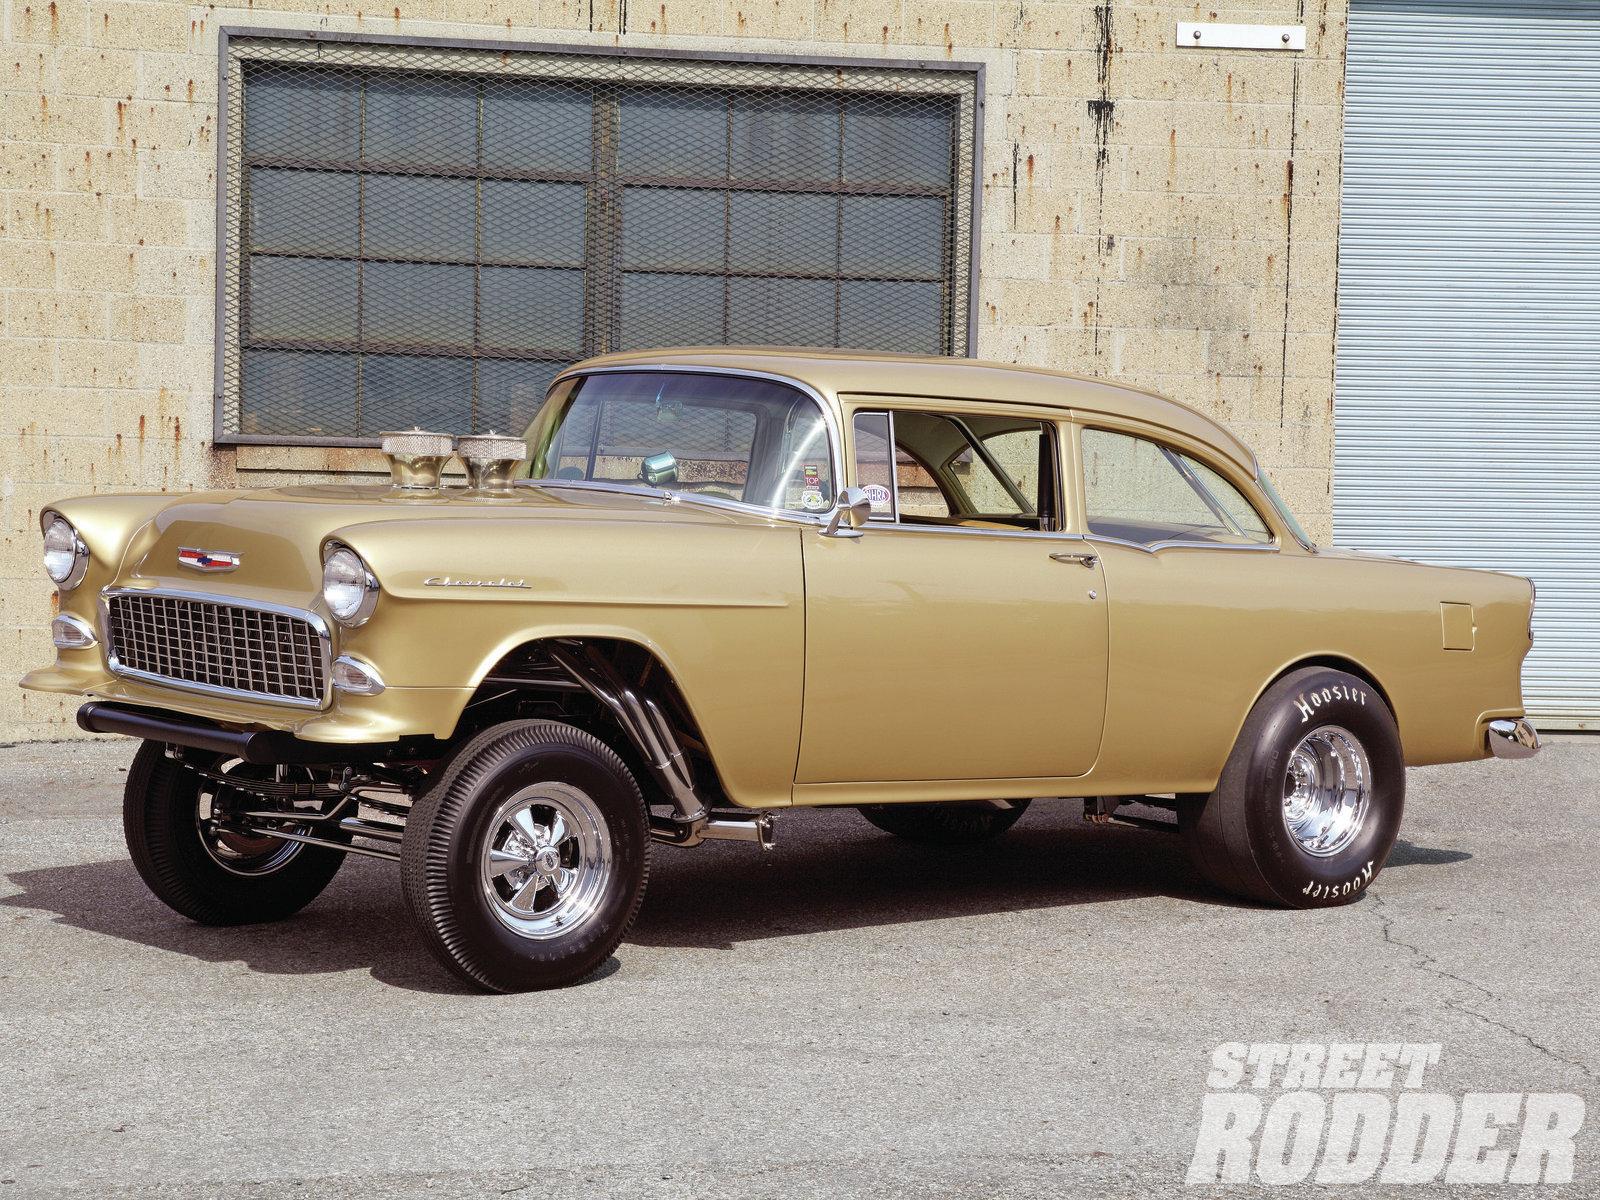 1955 Chevy Gasser classic cars hot rod drag racing wallpaper 1600x1200